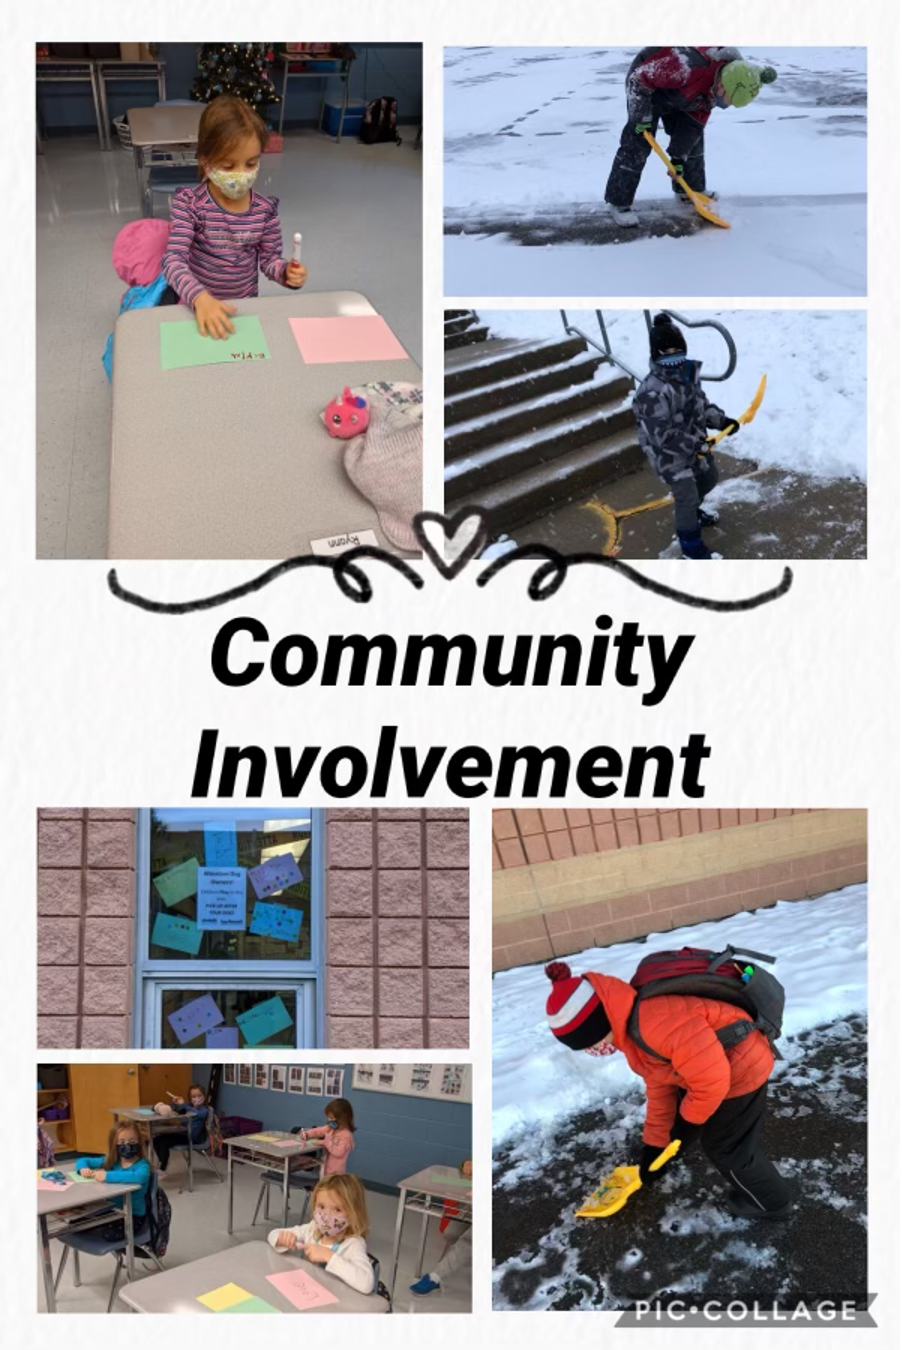 Allan A. Greenleaf Community Involvement Project